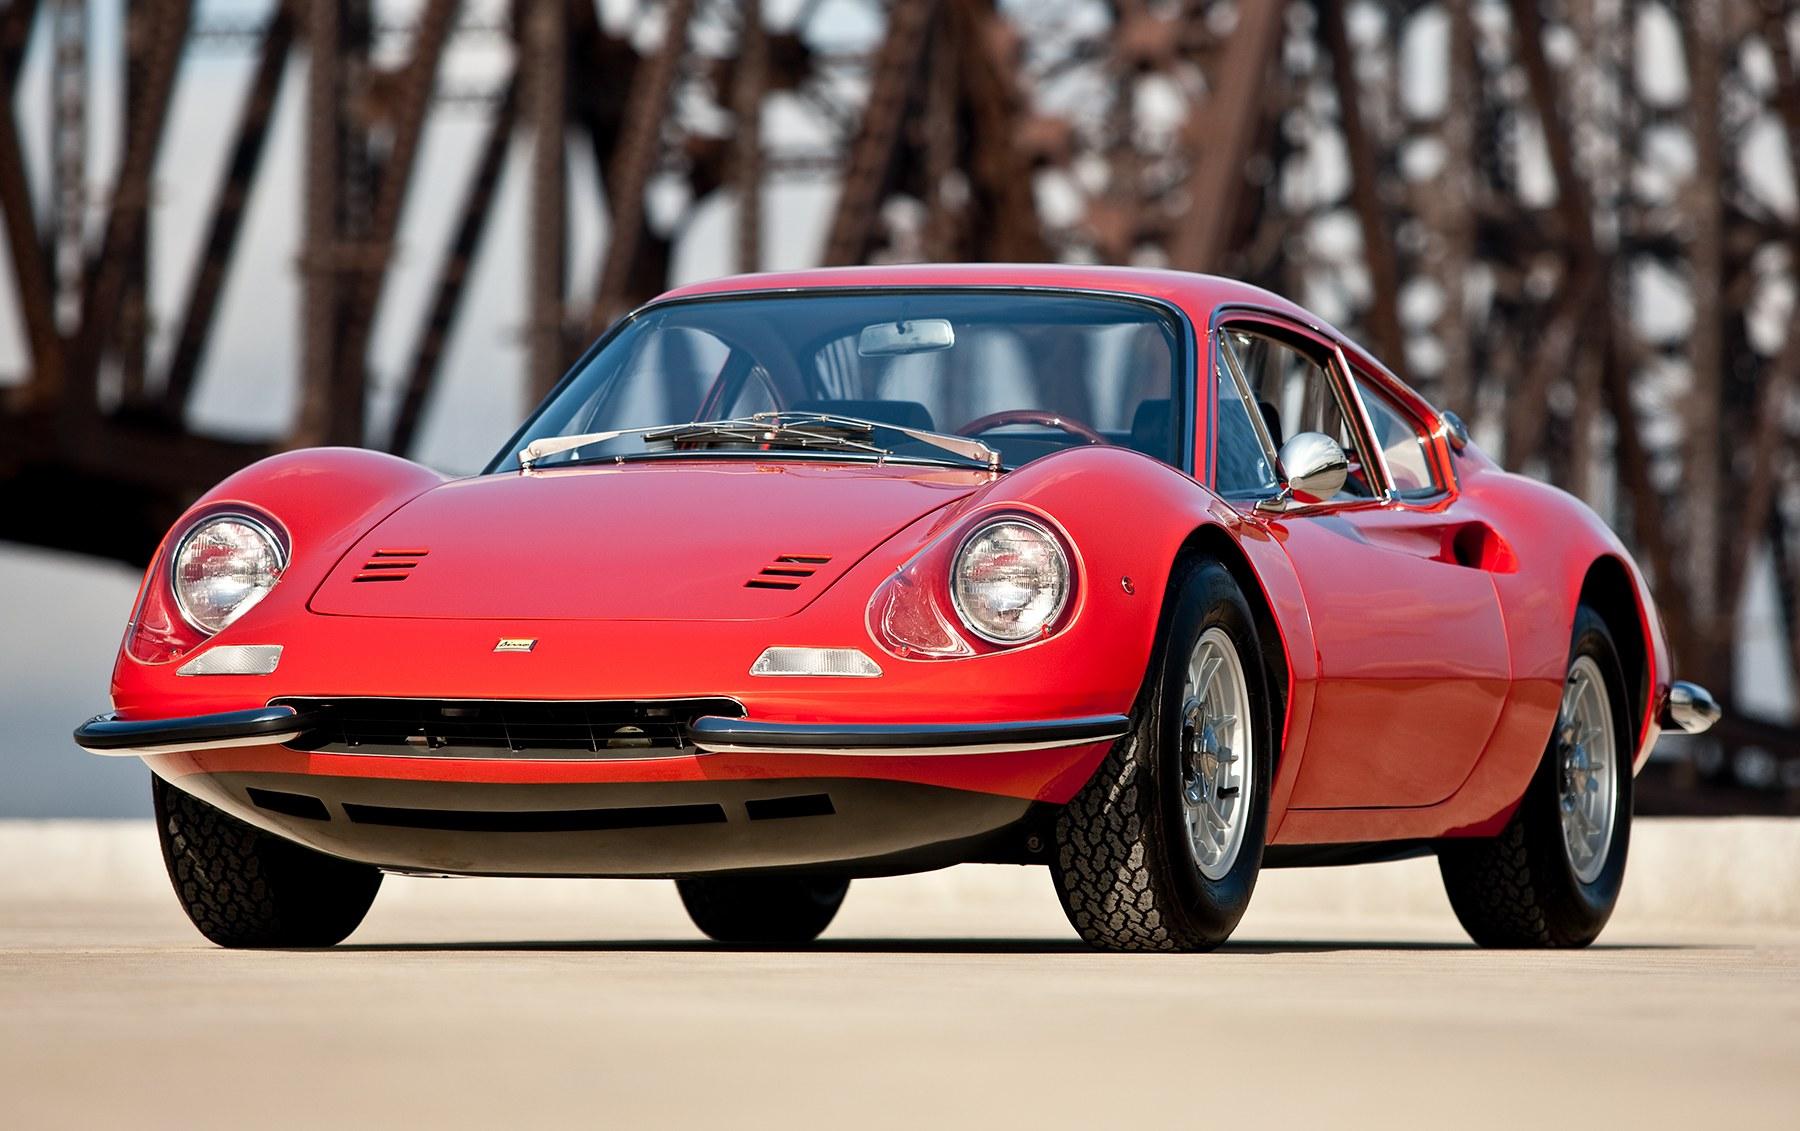 1968 Ferrari Dino 206 GT Alloy